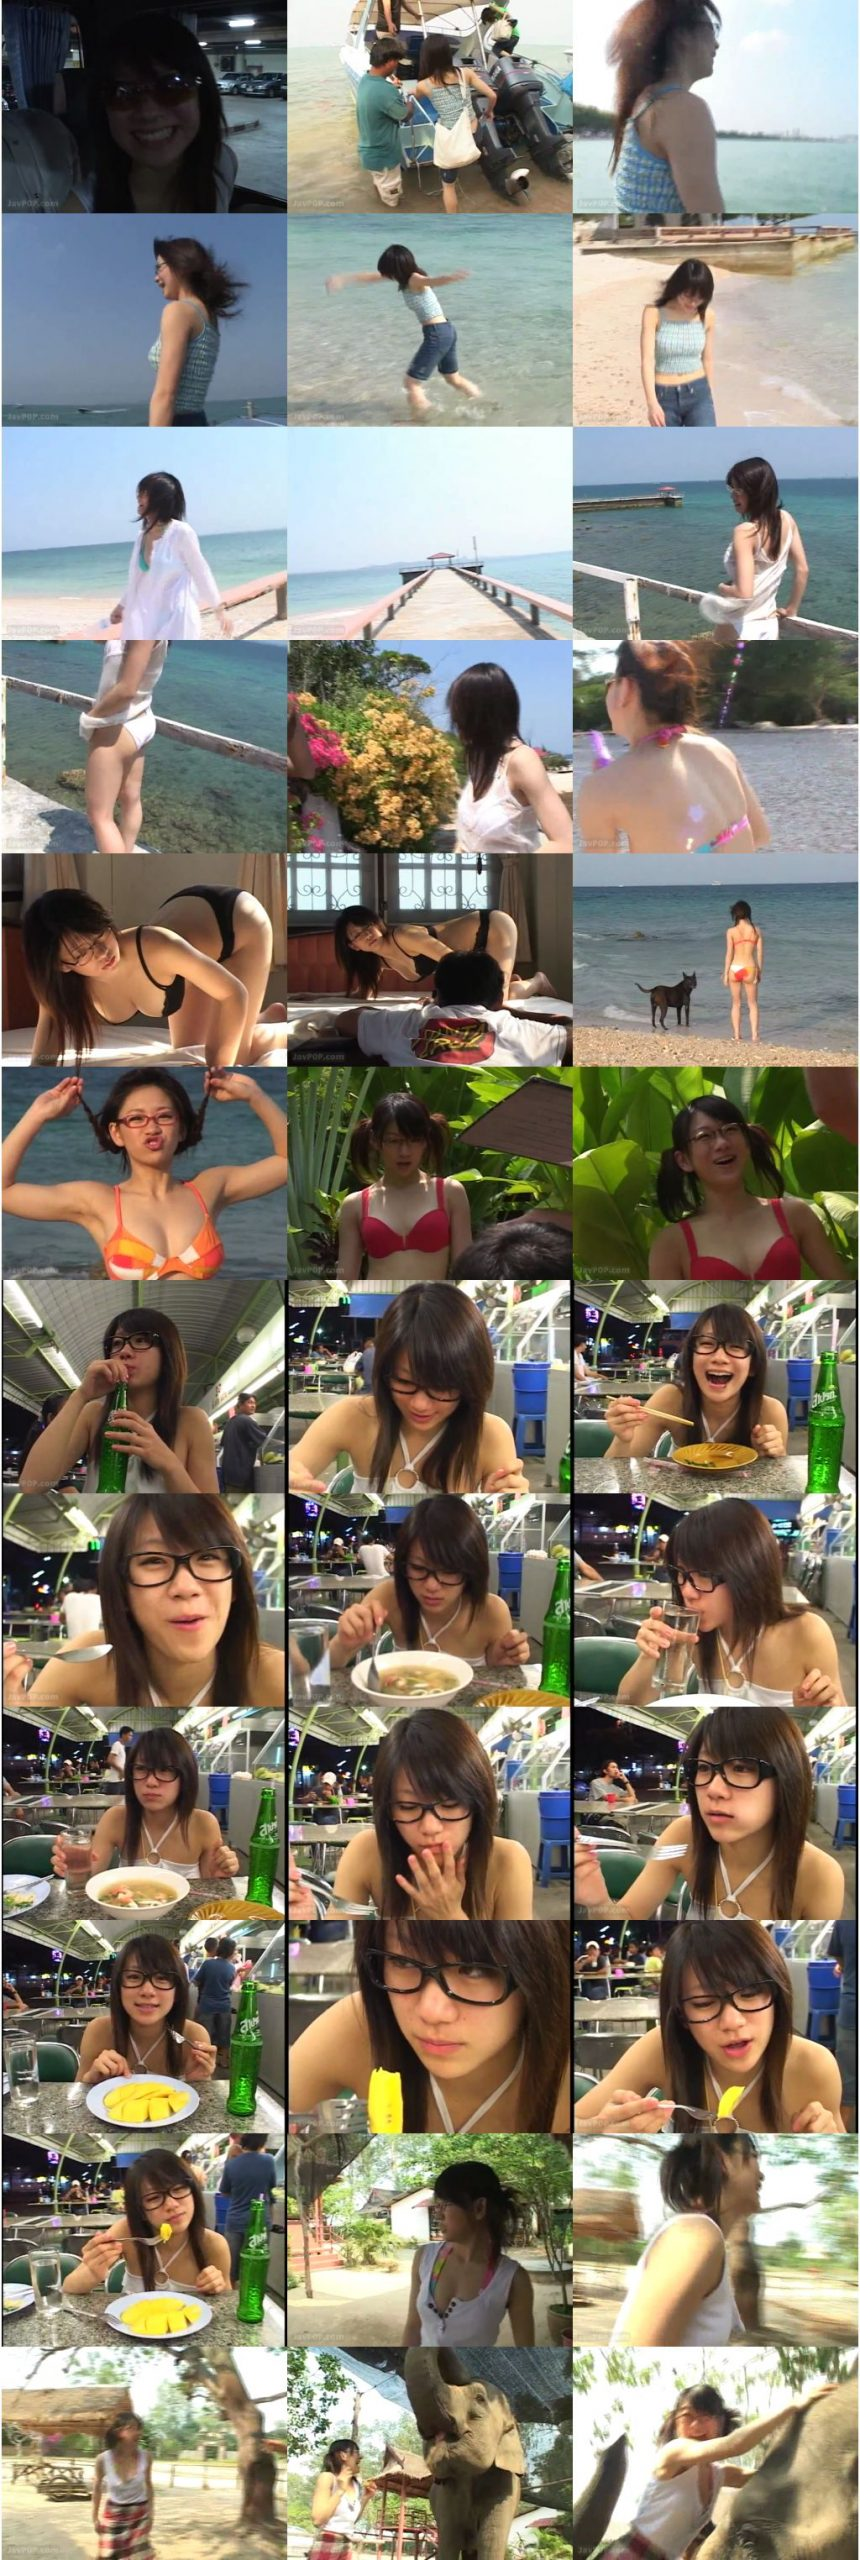 lpfd 7 ami tokito 1 s scaled - [LPFD-7] 時東ぁみ Ami Tokito – Occhiali